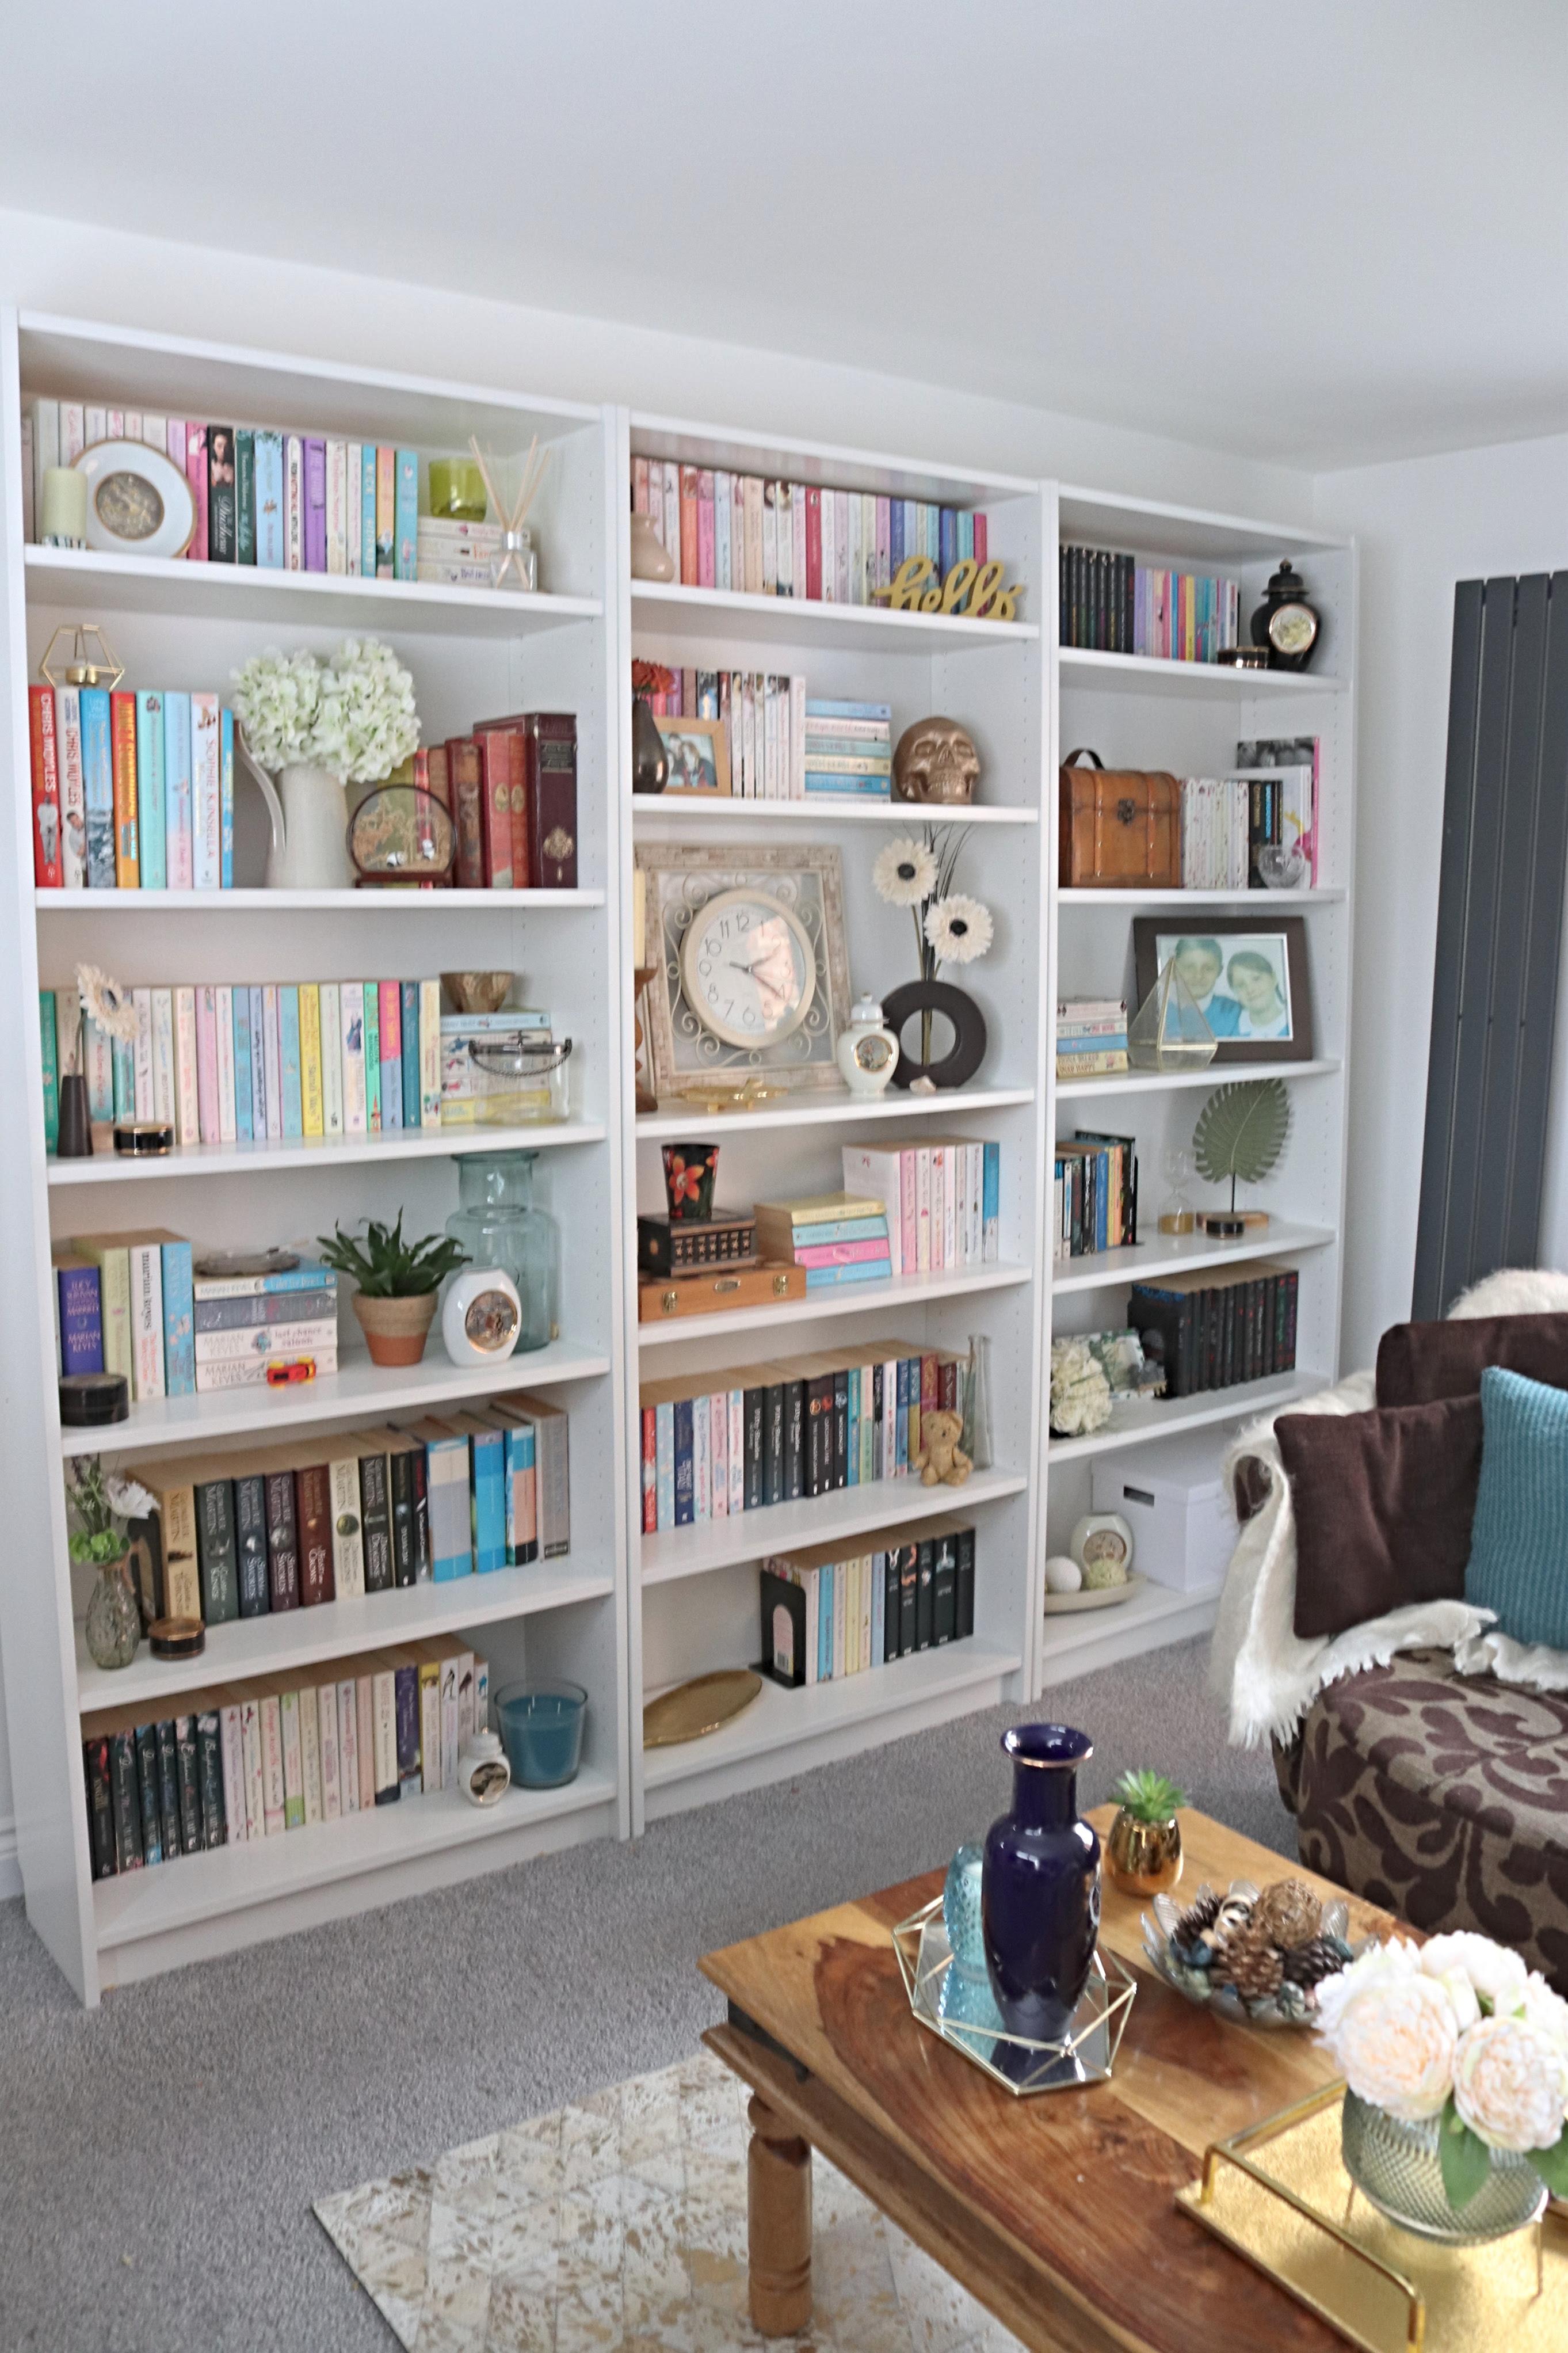 Ikea Billy Bookcase Shelf Pins - House Elements Design